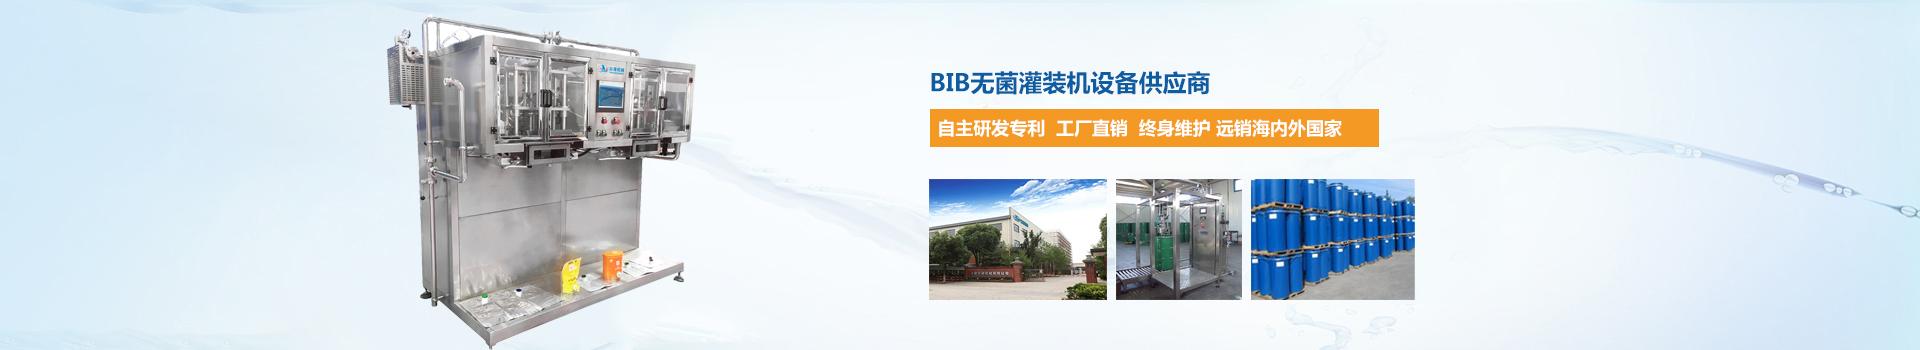 BIB無菌灌裝機